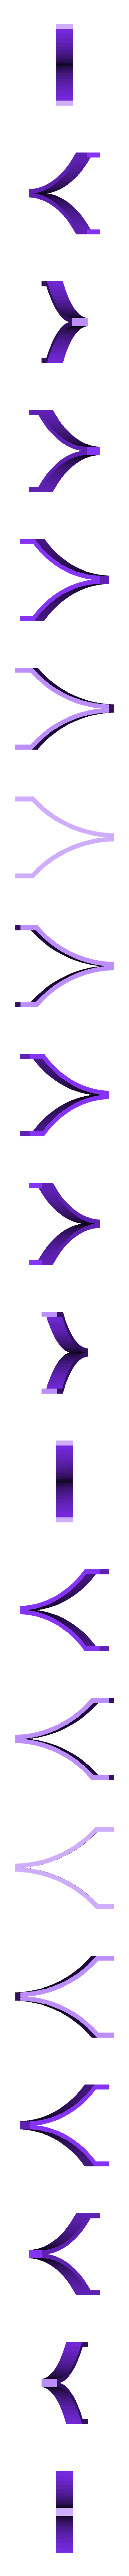 SolidSpring.STL Download free STL file Printed truck V1: Springs • 3D print template, MrCrankyface